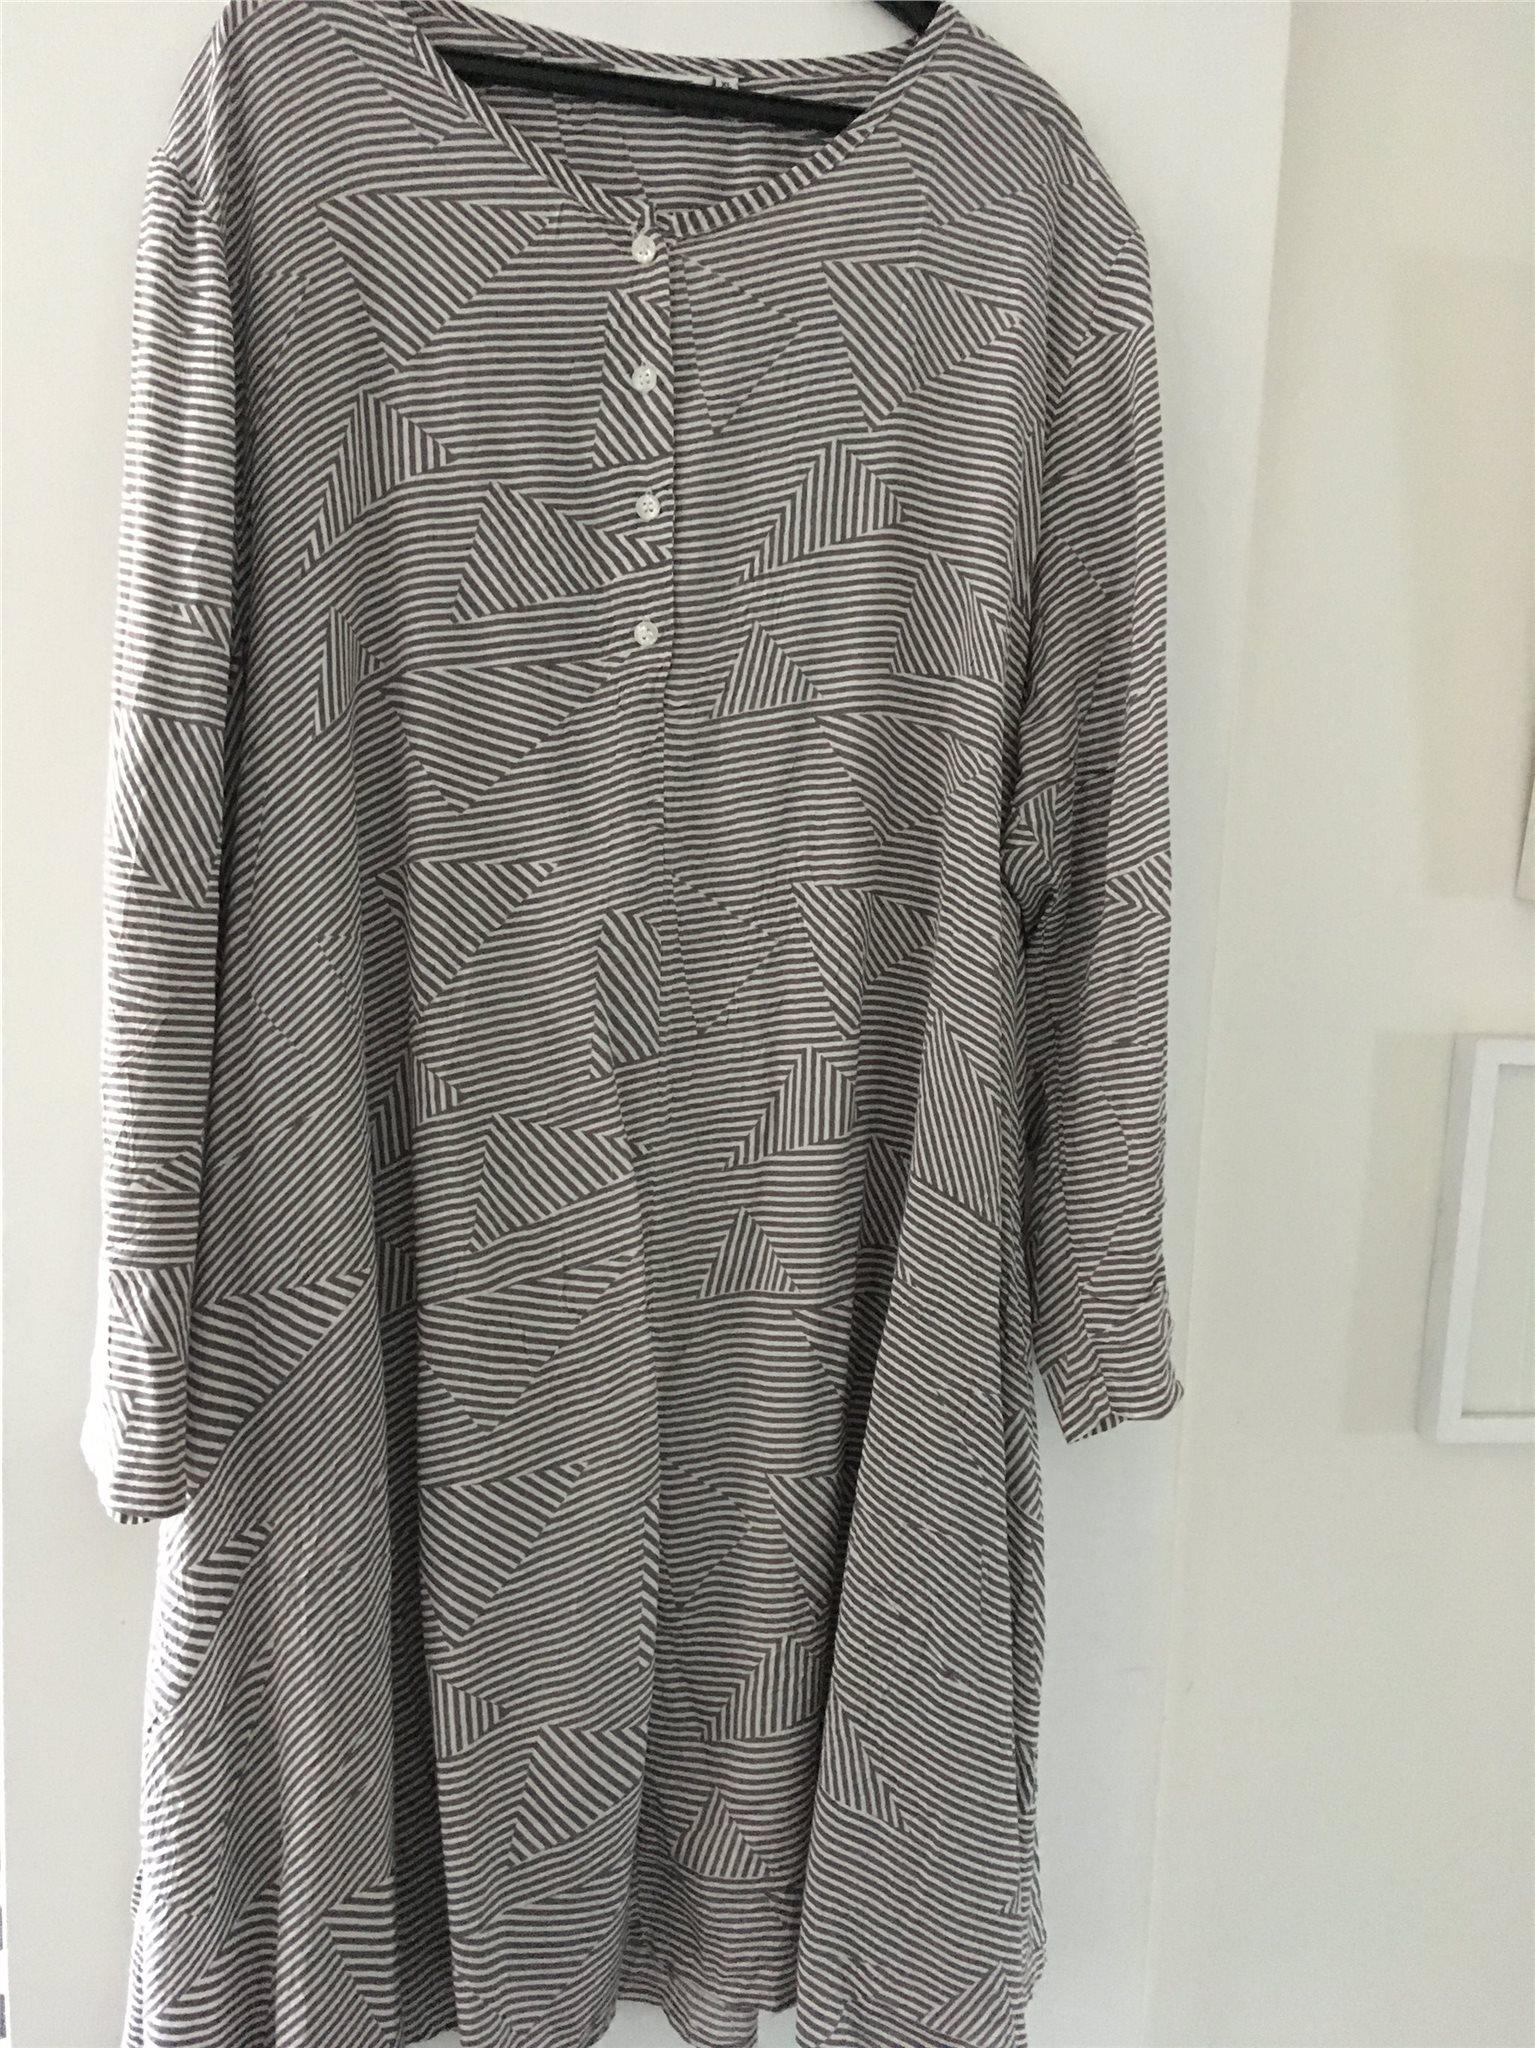 super cheap 9c4f0 a6deb Elegant tunika/ klänning från Masai, xl. (334934257) ᐈ Köp ...